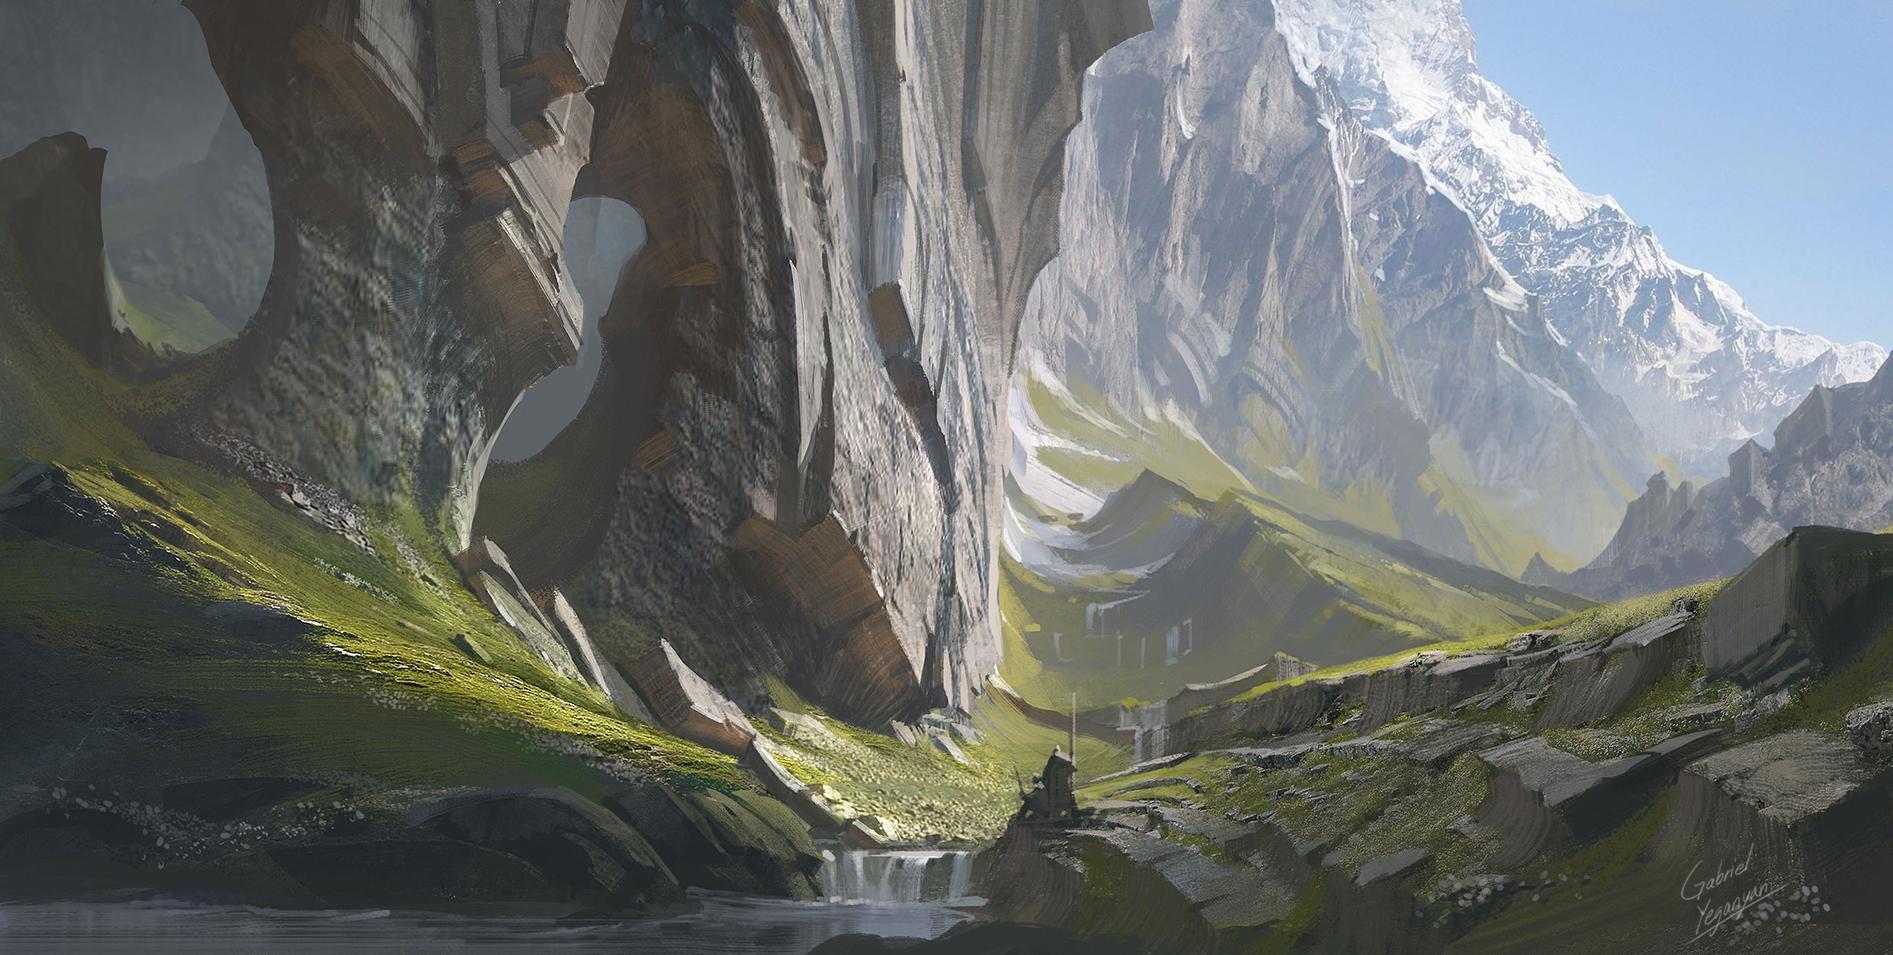 Foto de Gabriel Yeganyan® - Fuente: http://conceptartworld.com/artists/gabriel-yeganyan/